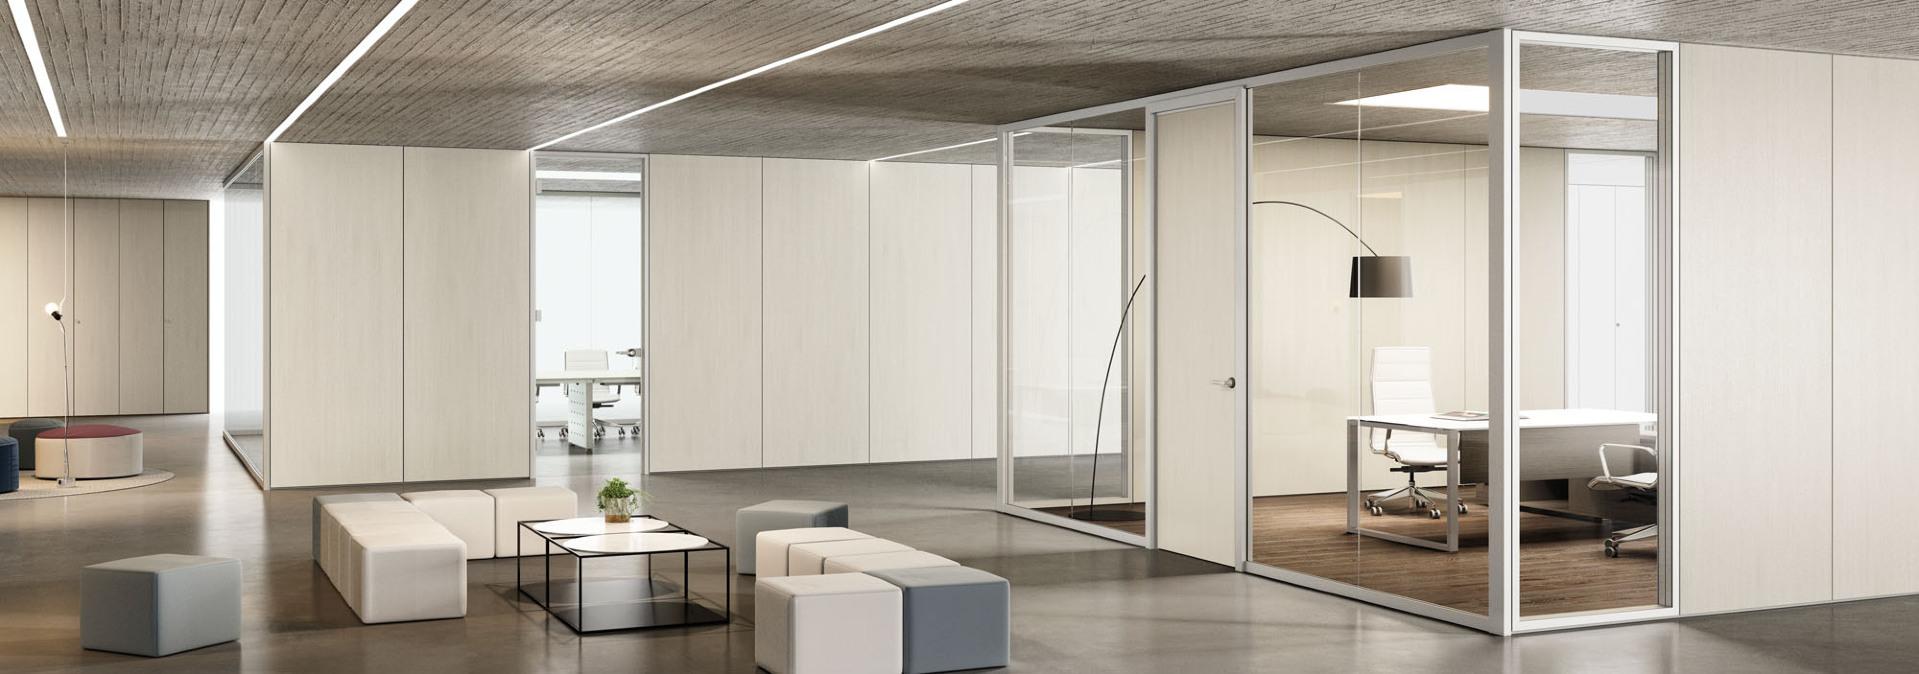 tecna-pareti-divisorie-uffici-1.jpg